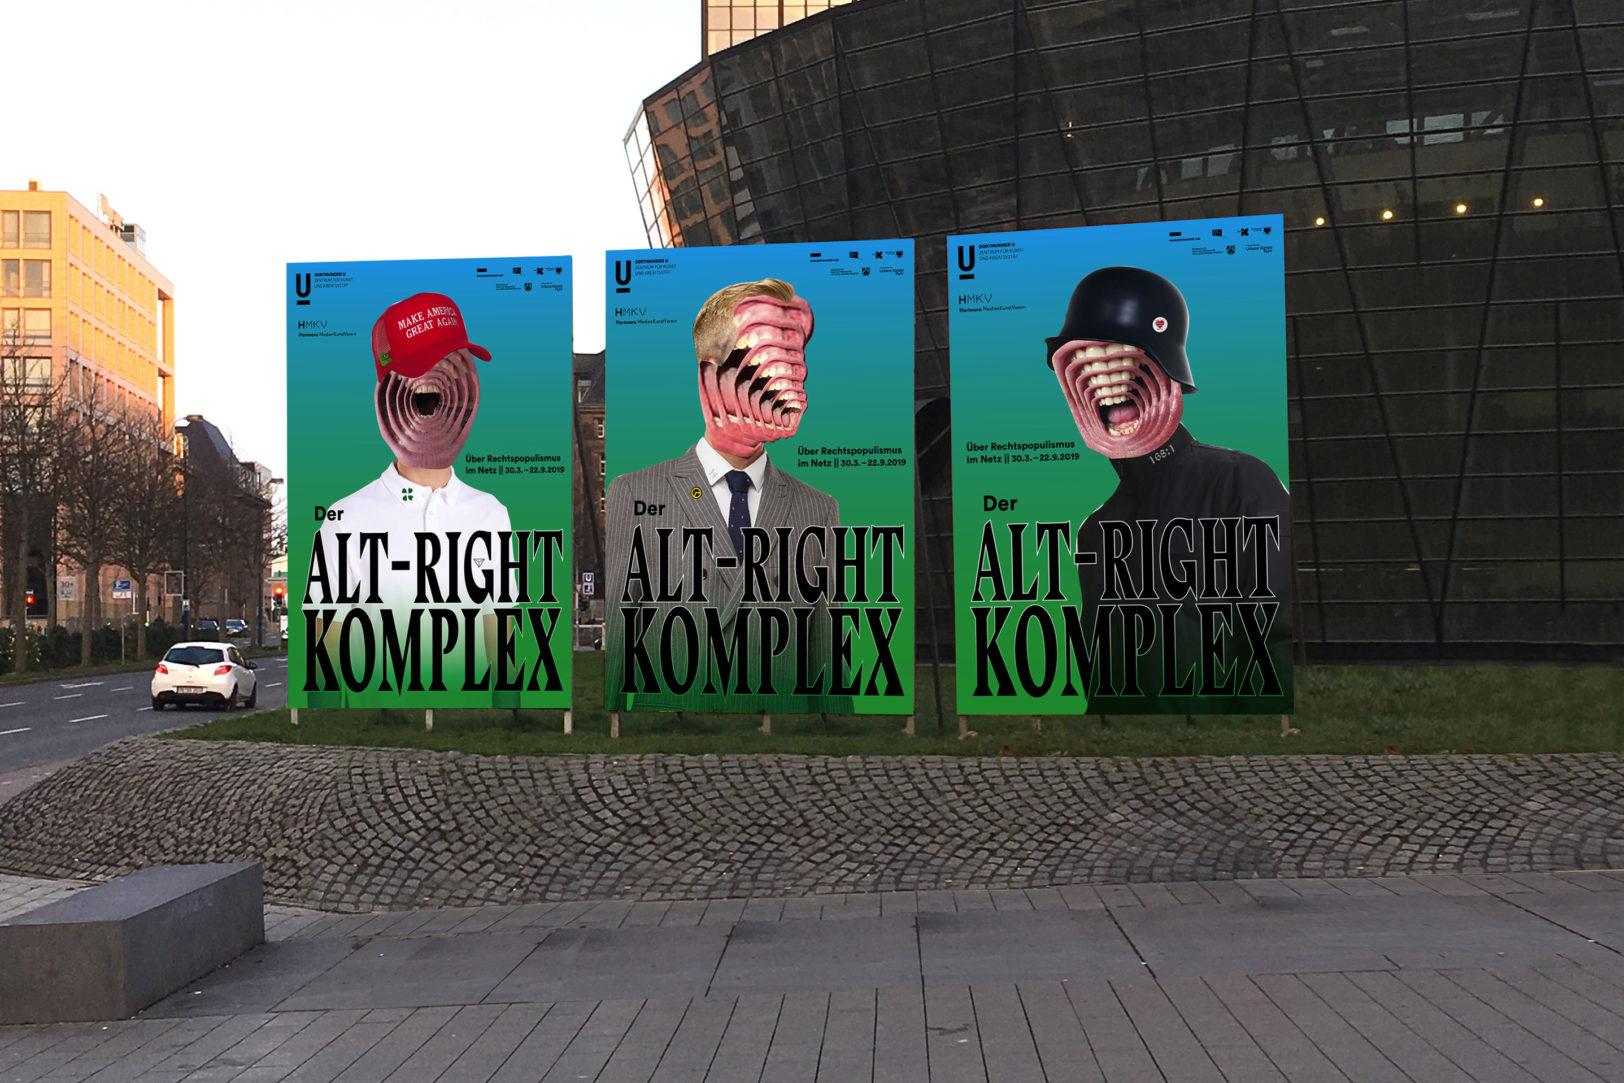 http://e-o-t.de/wordpress/wp-content/uploads/2019/04/eot-AltRightKomplex-identity.jpg